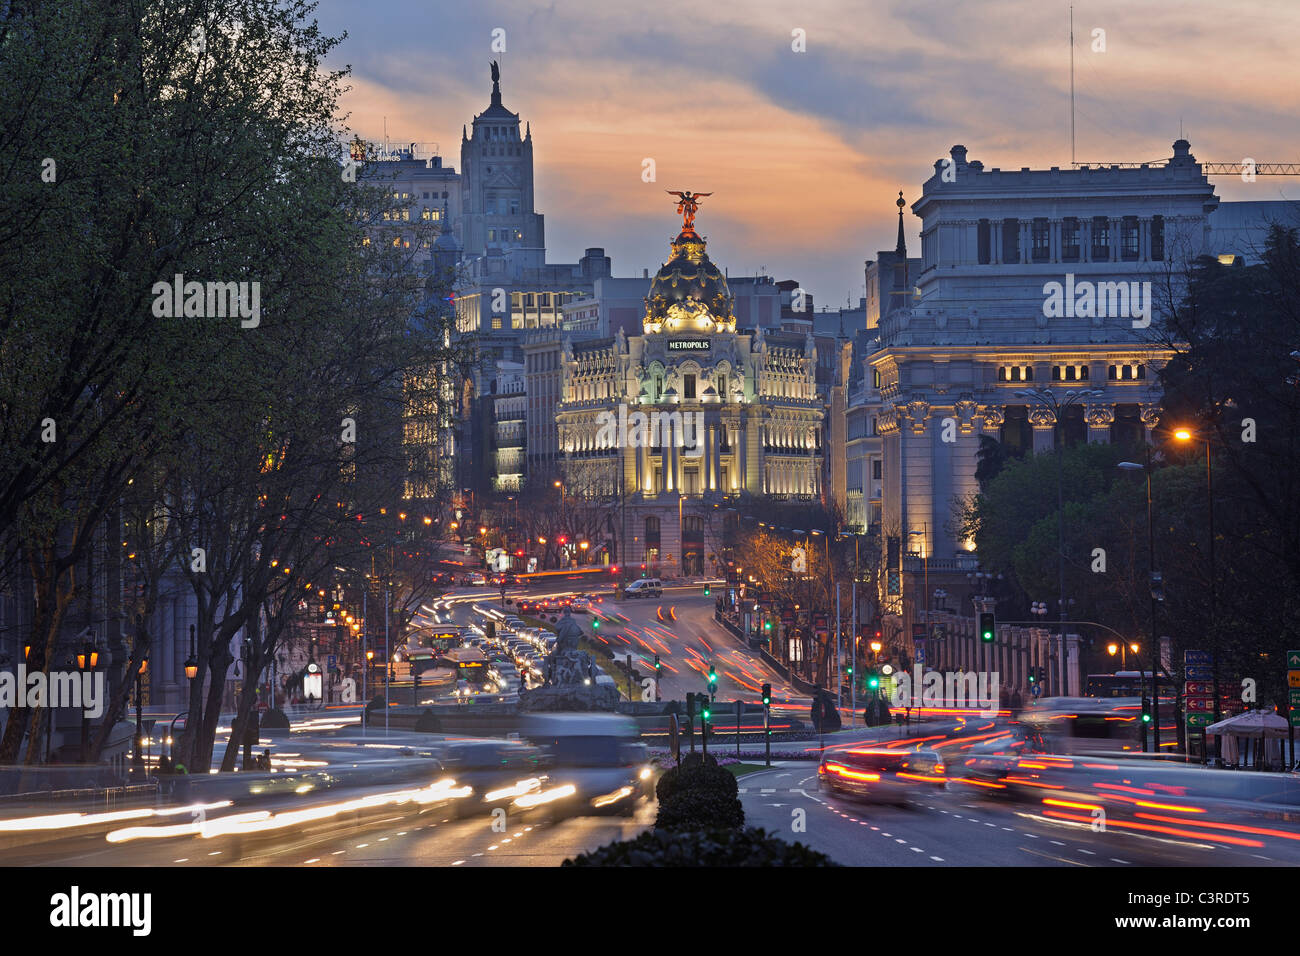 Madrid, View of Calle de Alcala and Plaza de Cibeles, Edificio Metropolis blurred traffic at dusk - Stock Image